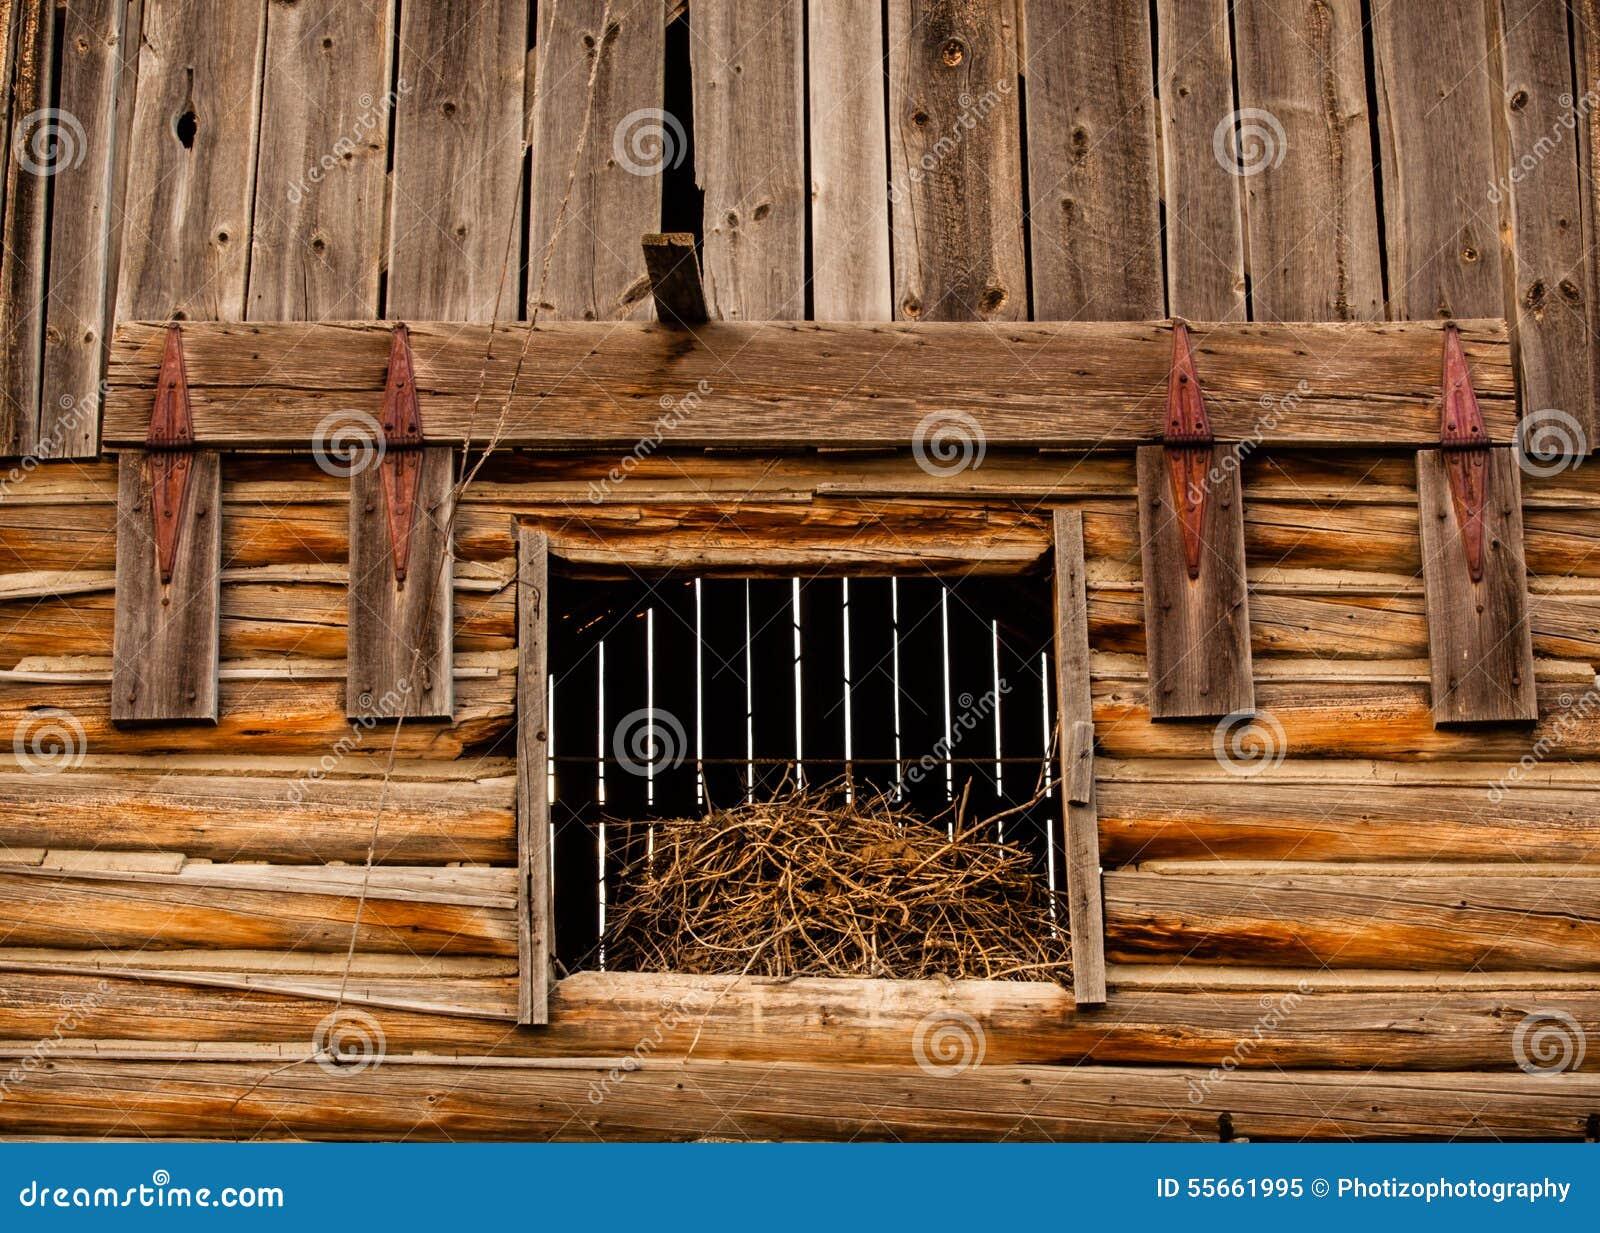 Barn hay loft door stock image image of worn wood for Barn loft doors